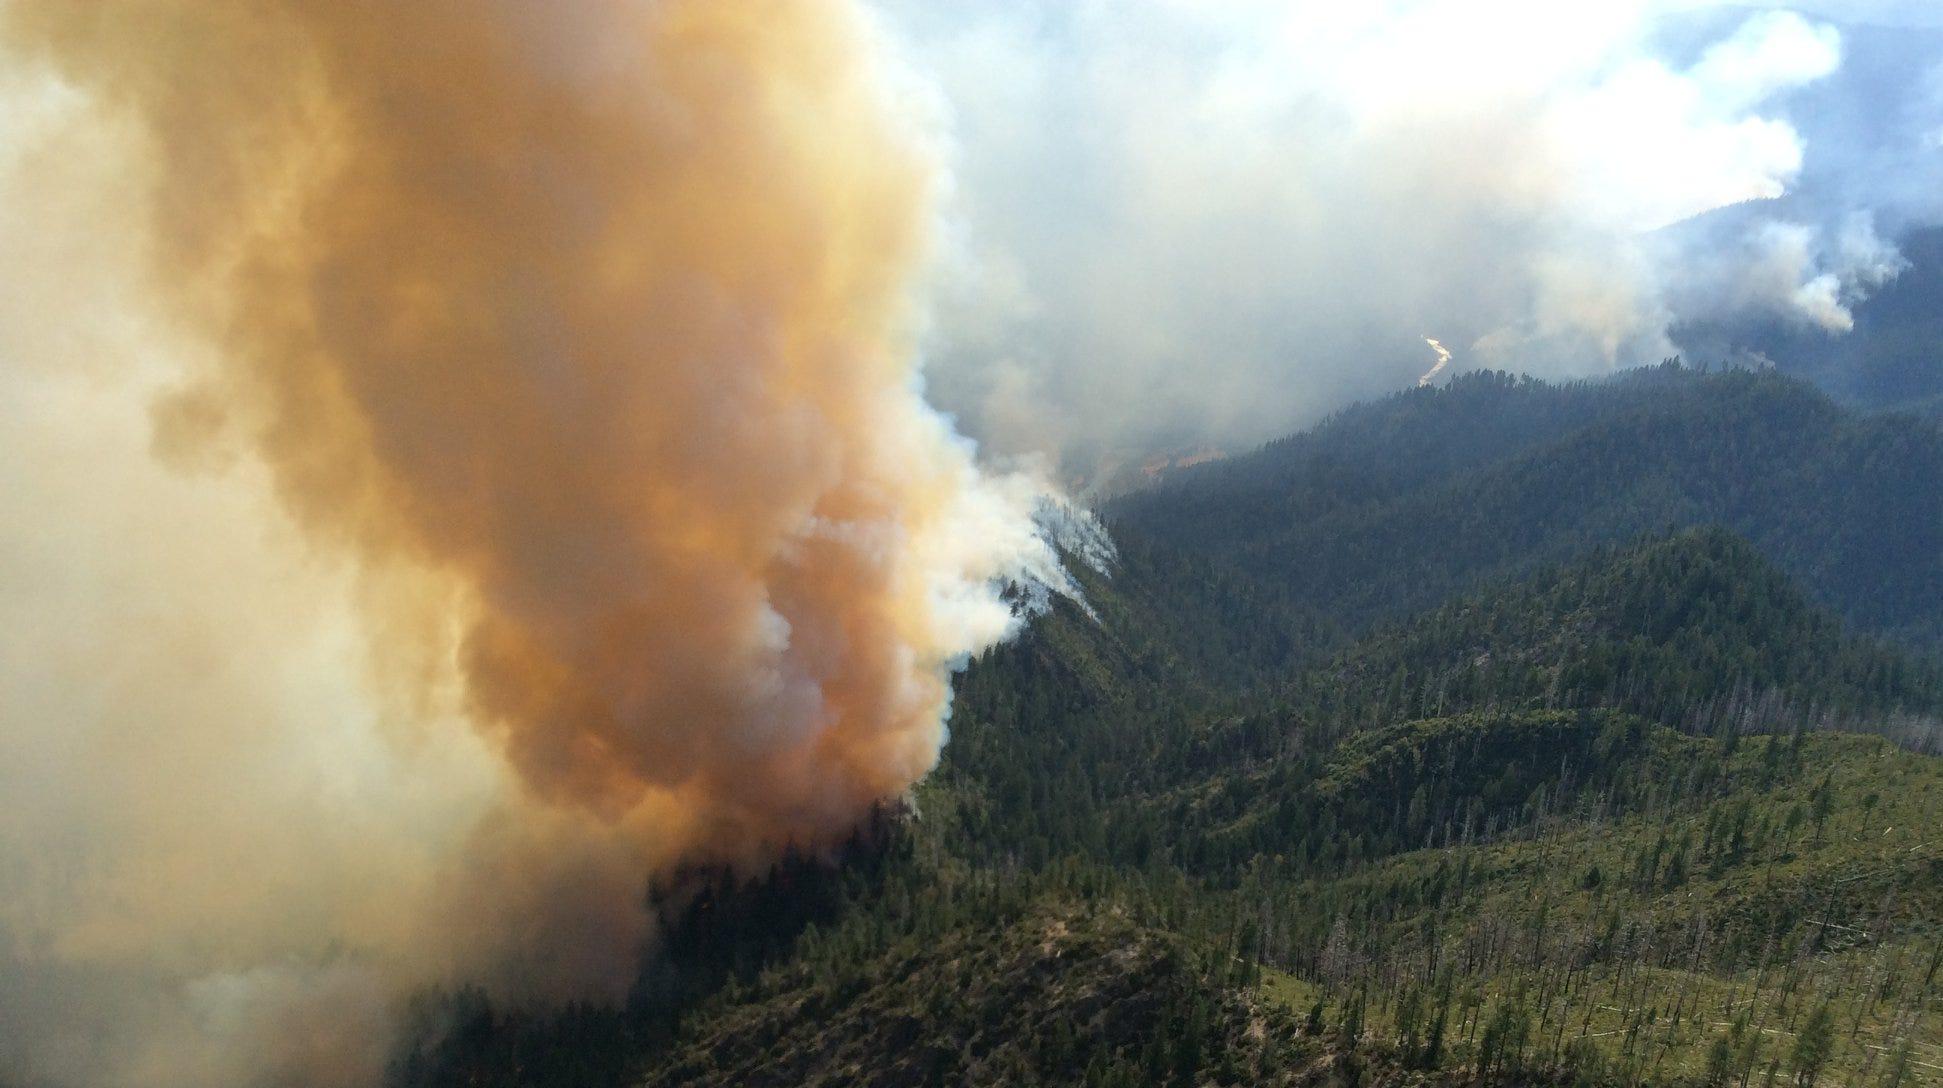 Smoke rises over the Klondike Fire.